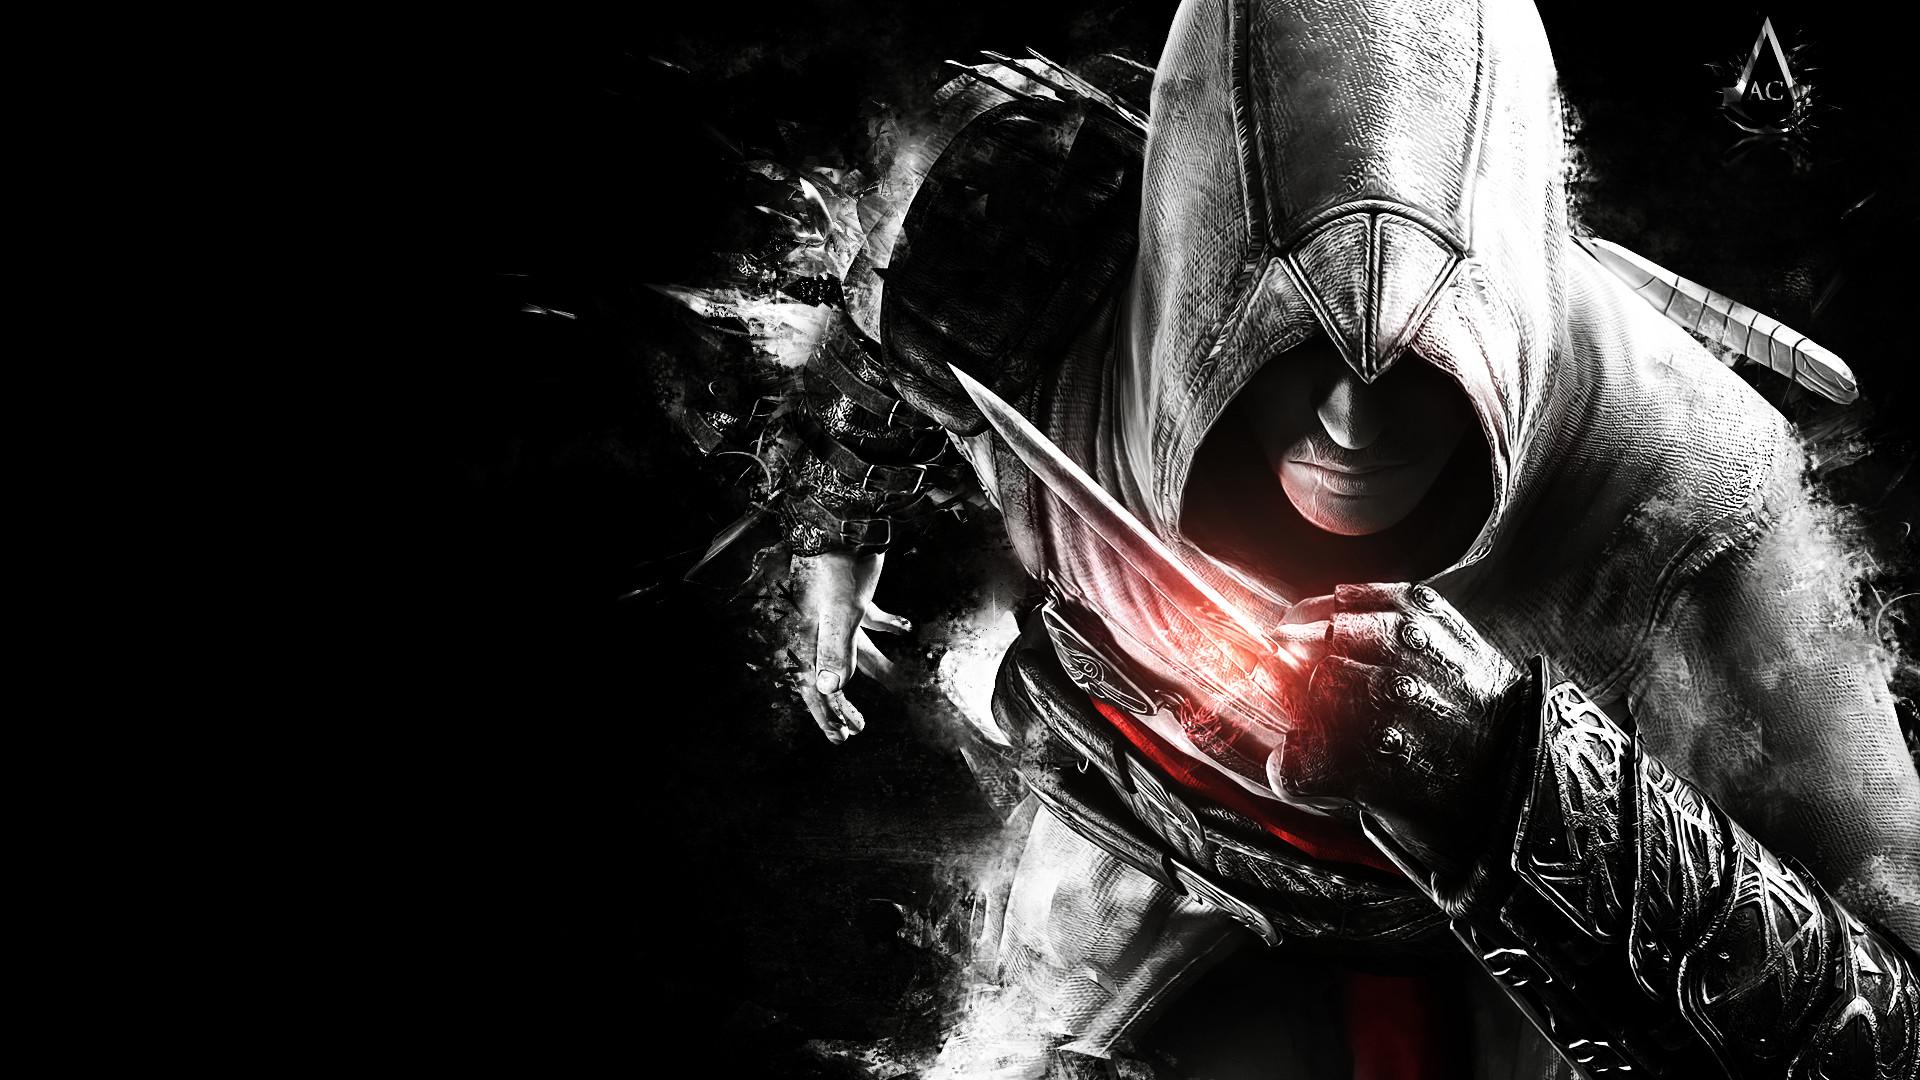 Creed Wallpaper Widescreen Hdgames Games Assassins Creed Desktop .